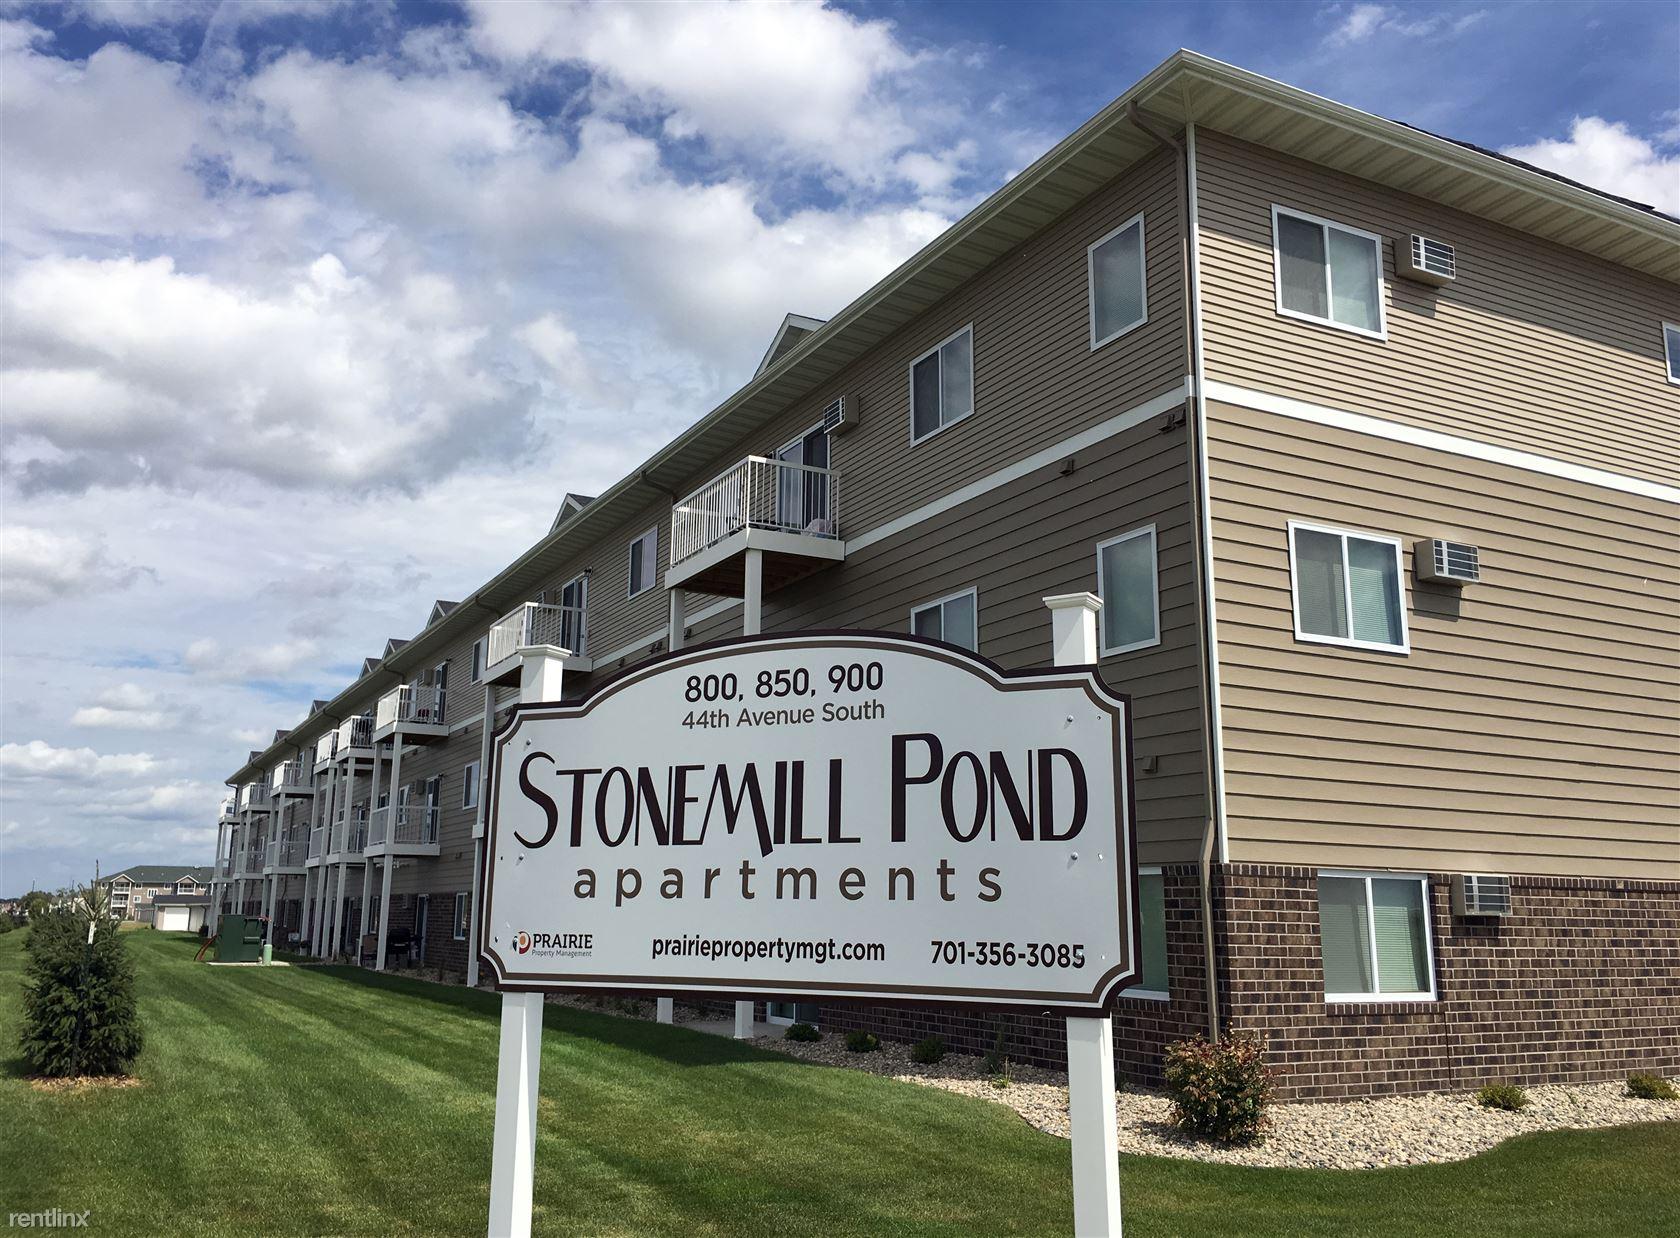 Stonemill Pond Apartments